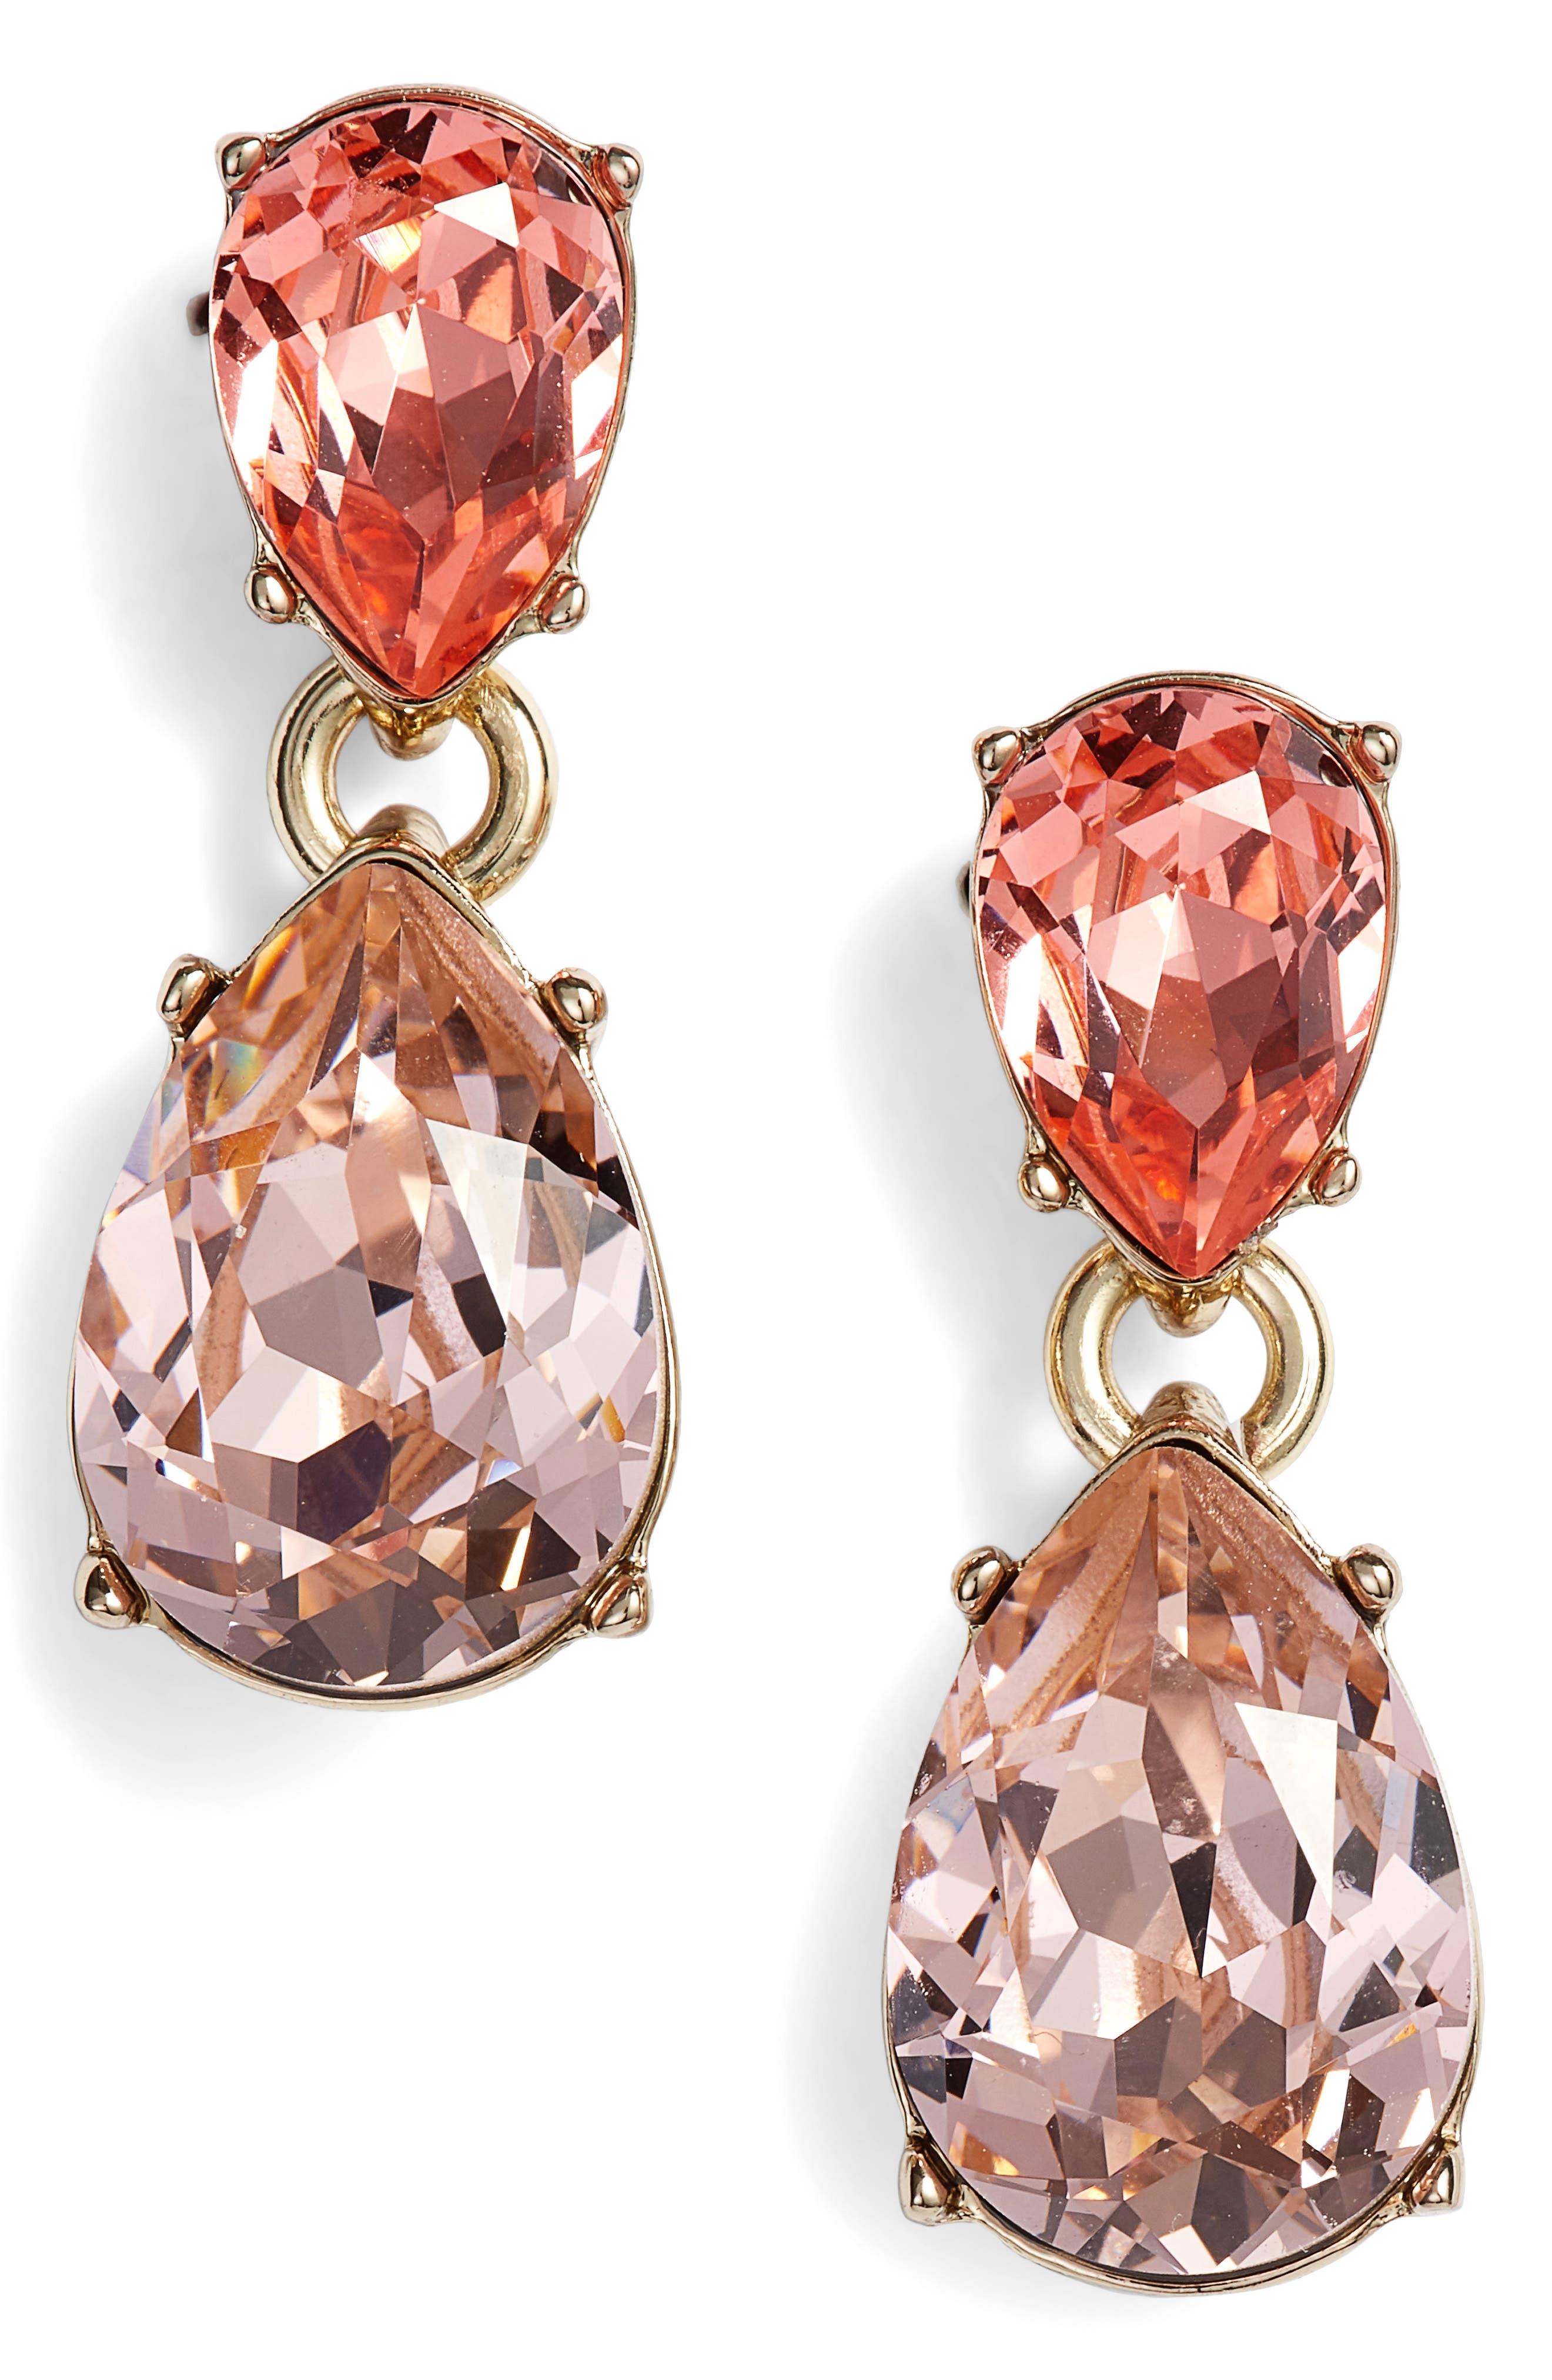 Double Pear Crystal Earrings,                             Main thumbnail 1, color,                             Gold/ Peach Multi